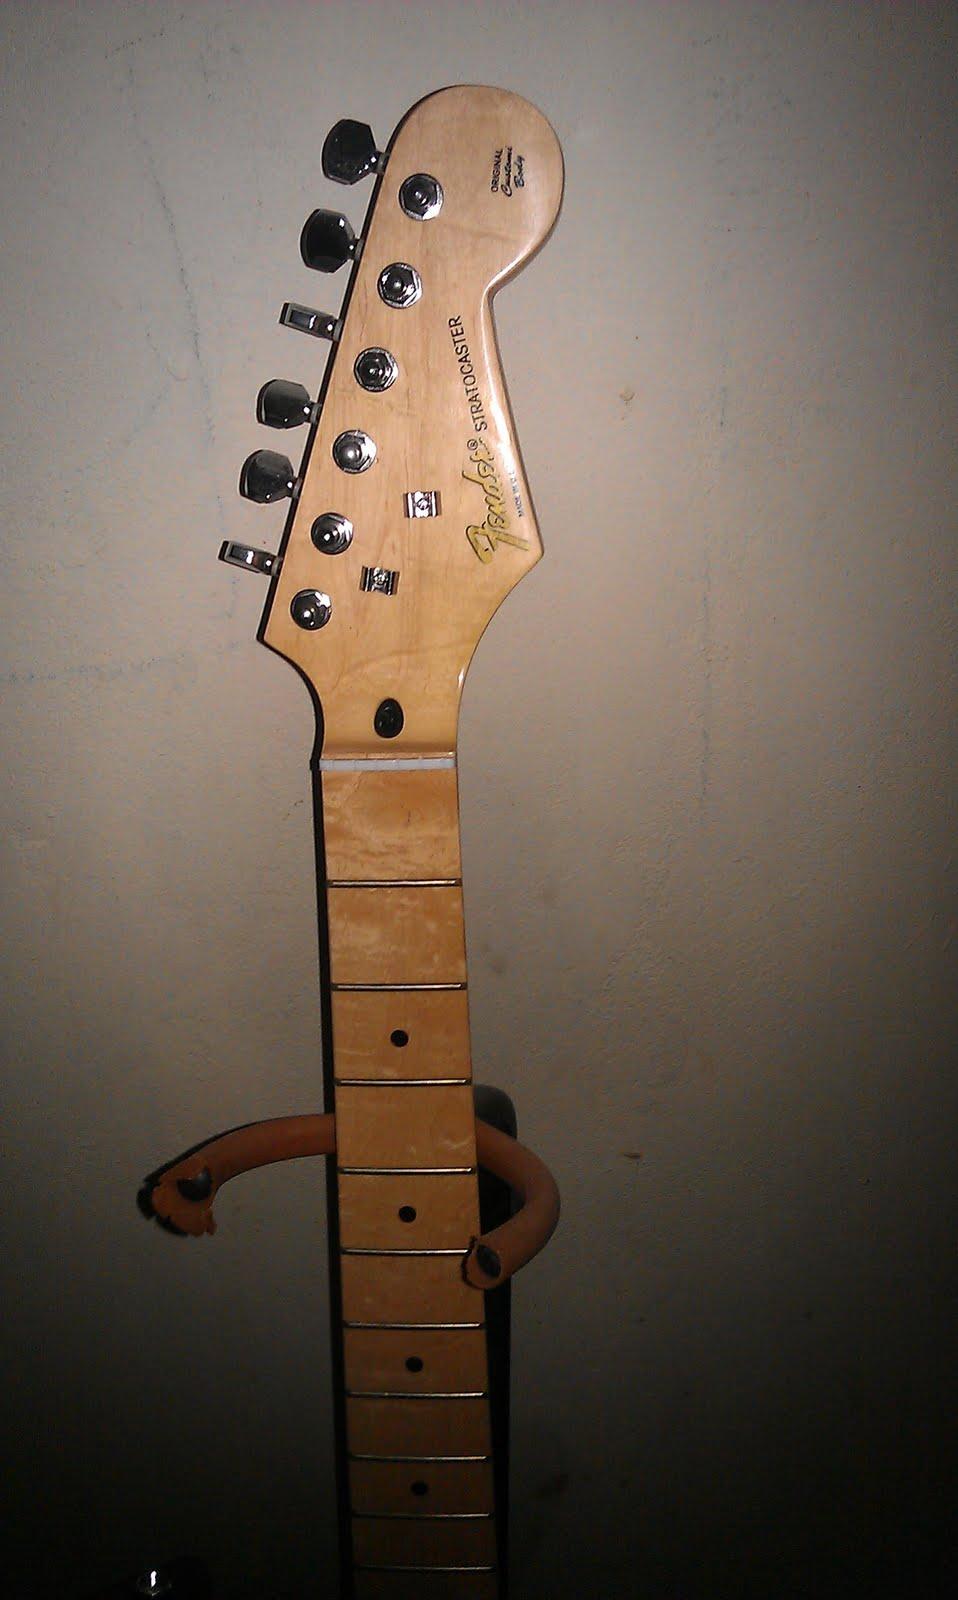 2011 Honda Civic For Sale >> I sell stuff: FAKE Fender Stratocaster for sale - SOLD